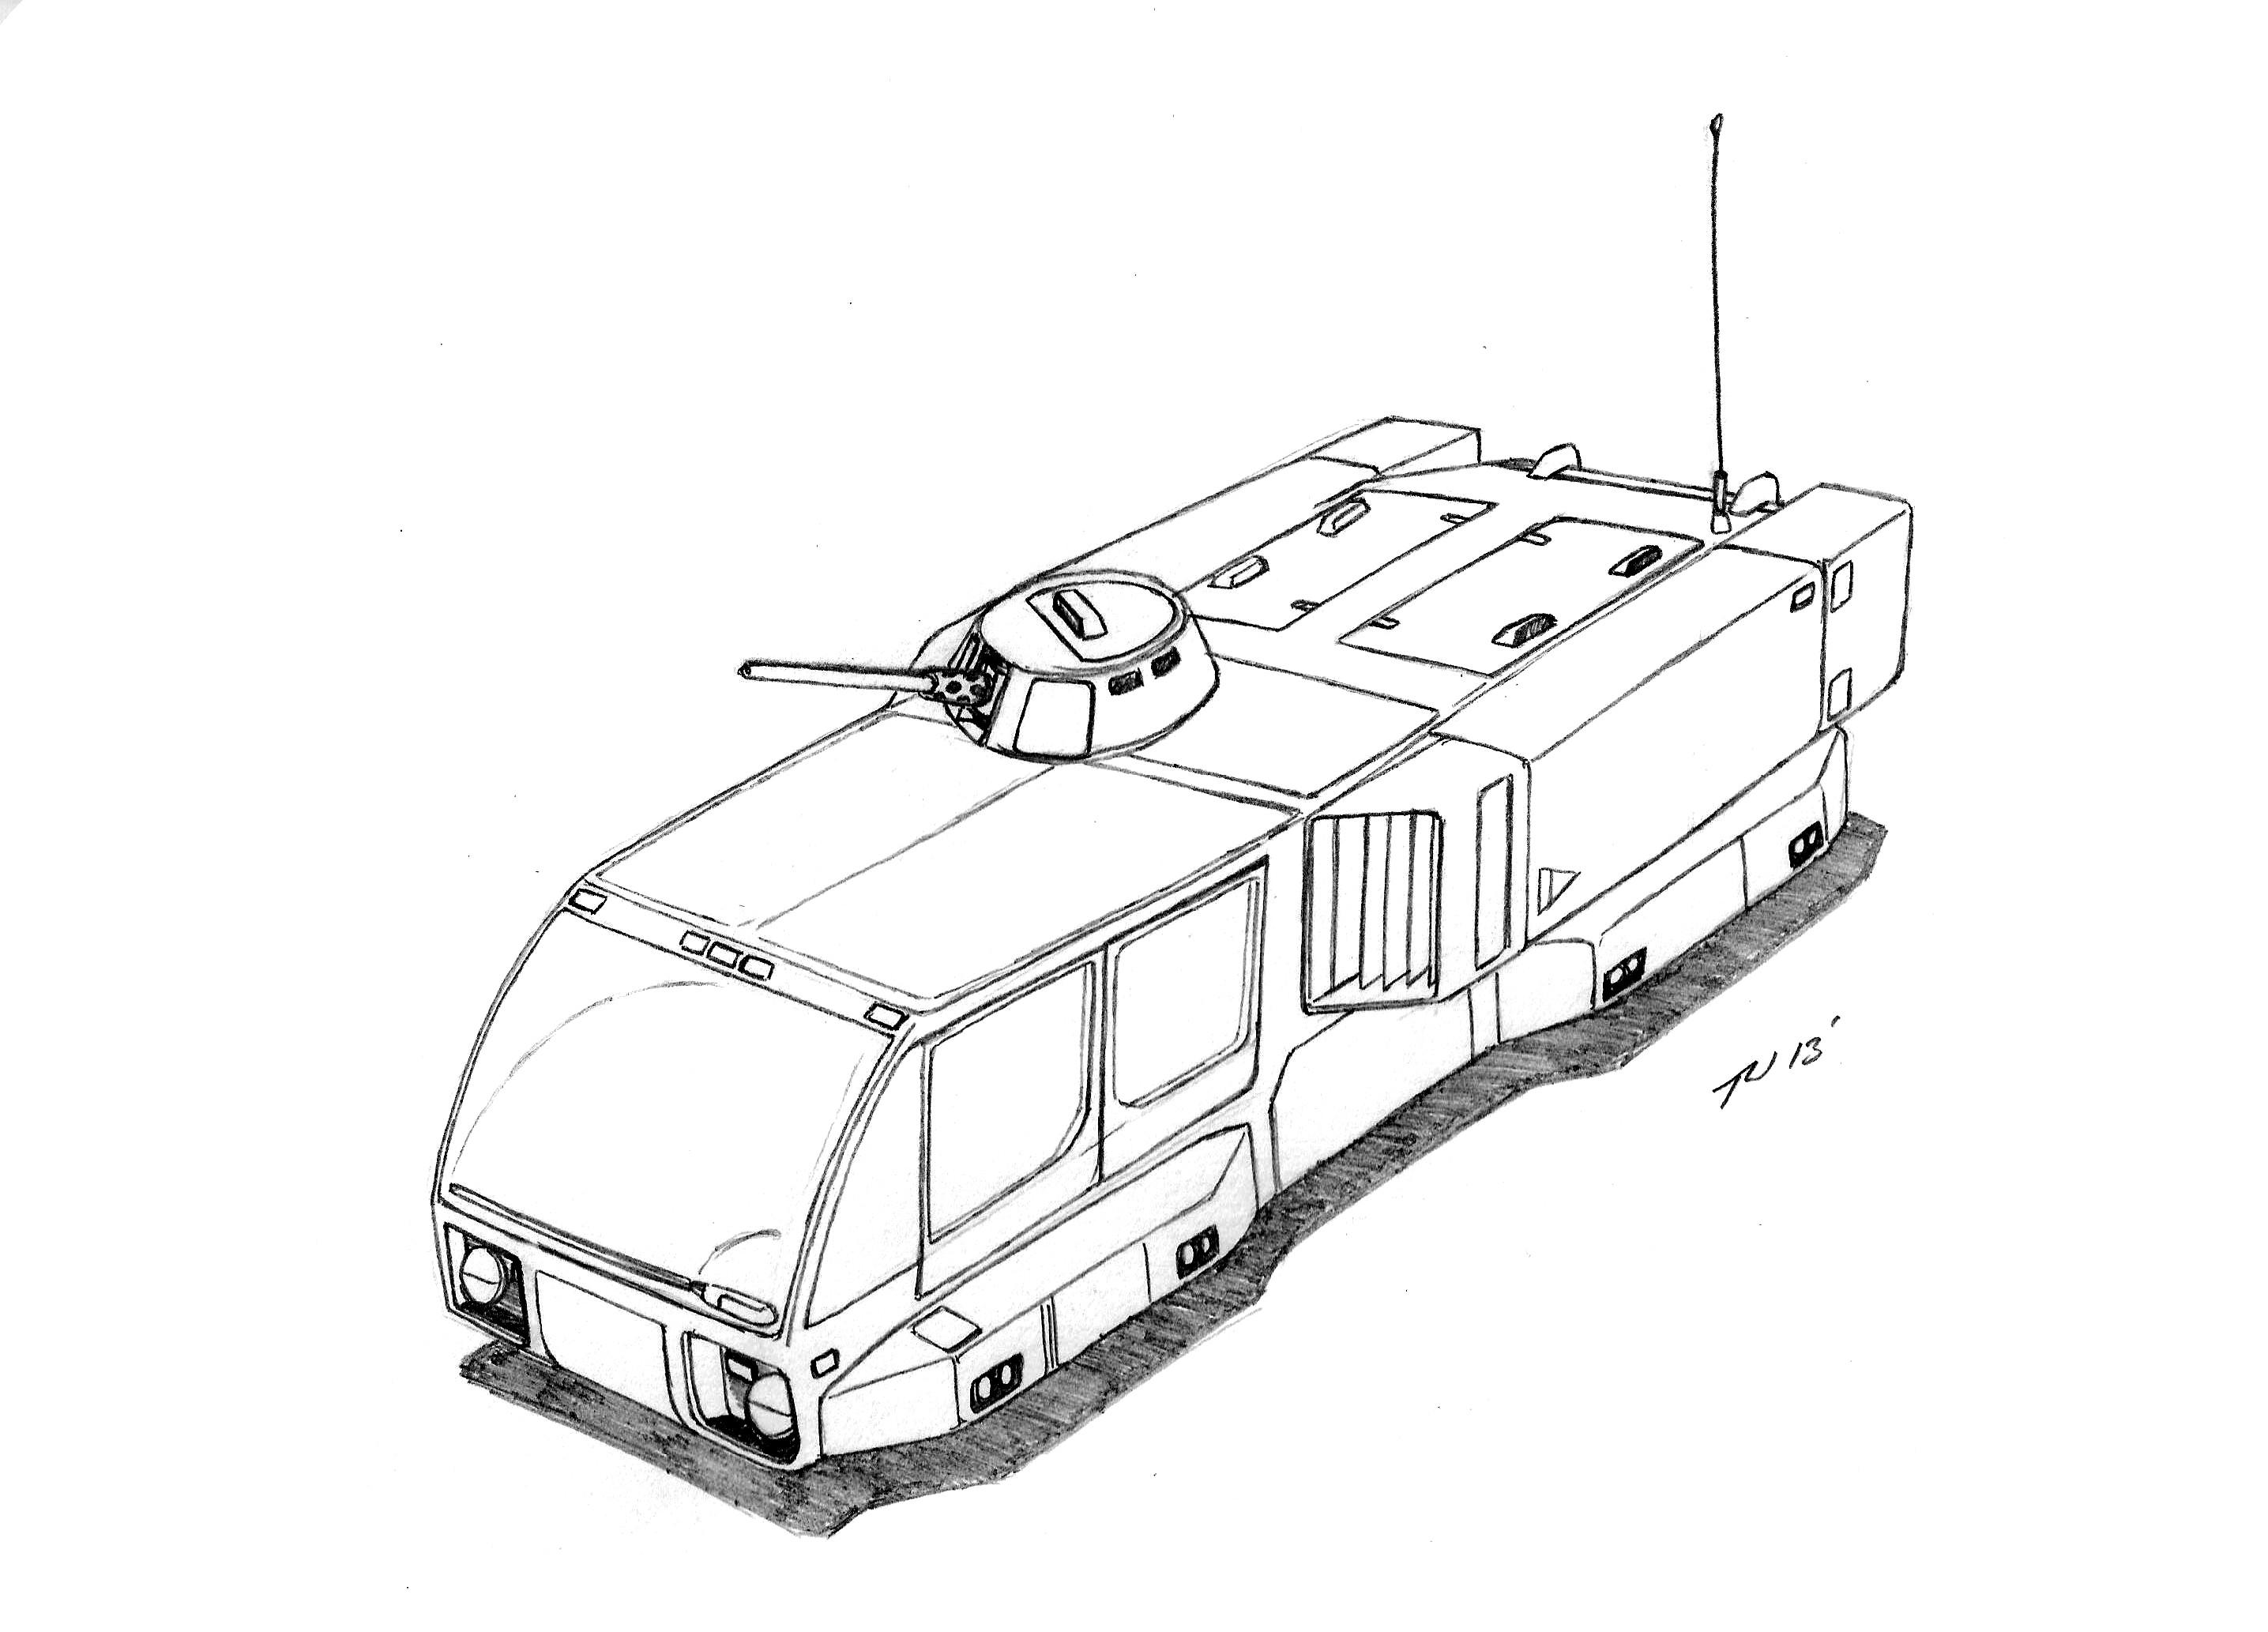 Steyr Daimler Puch Aht 1 Armored Hover Transport